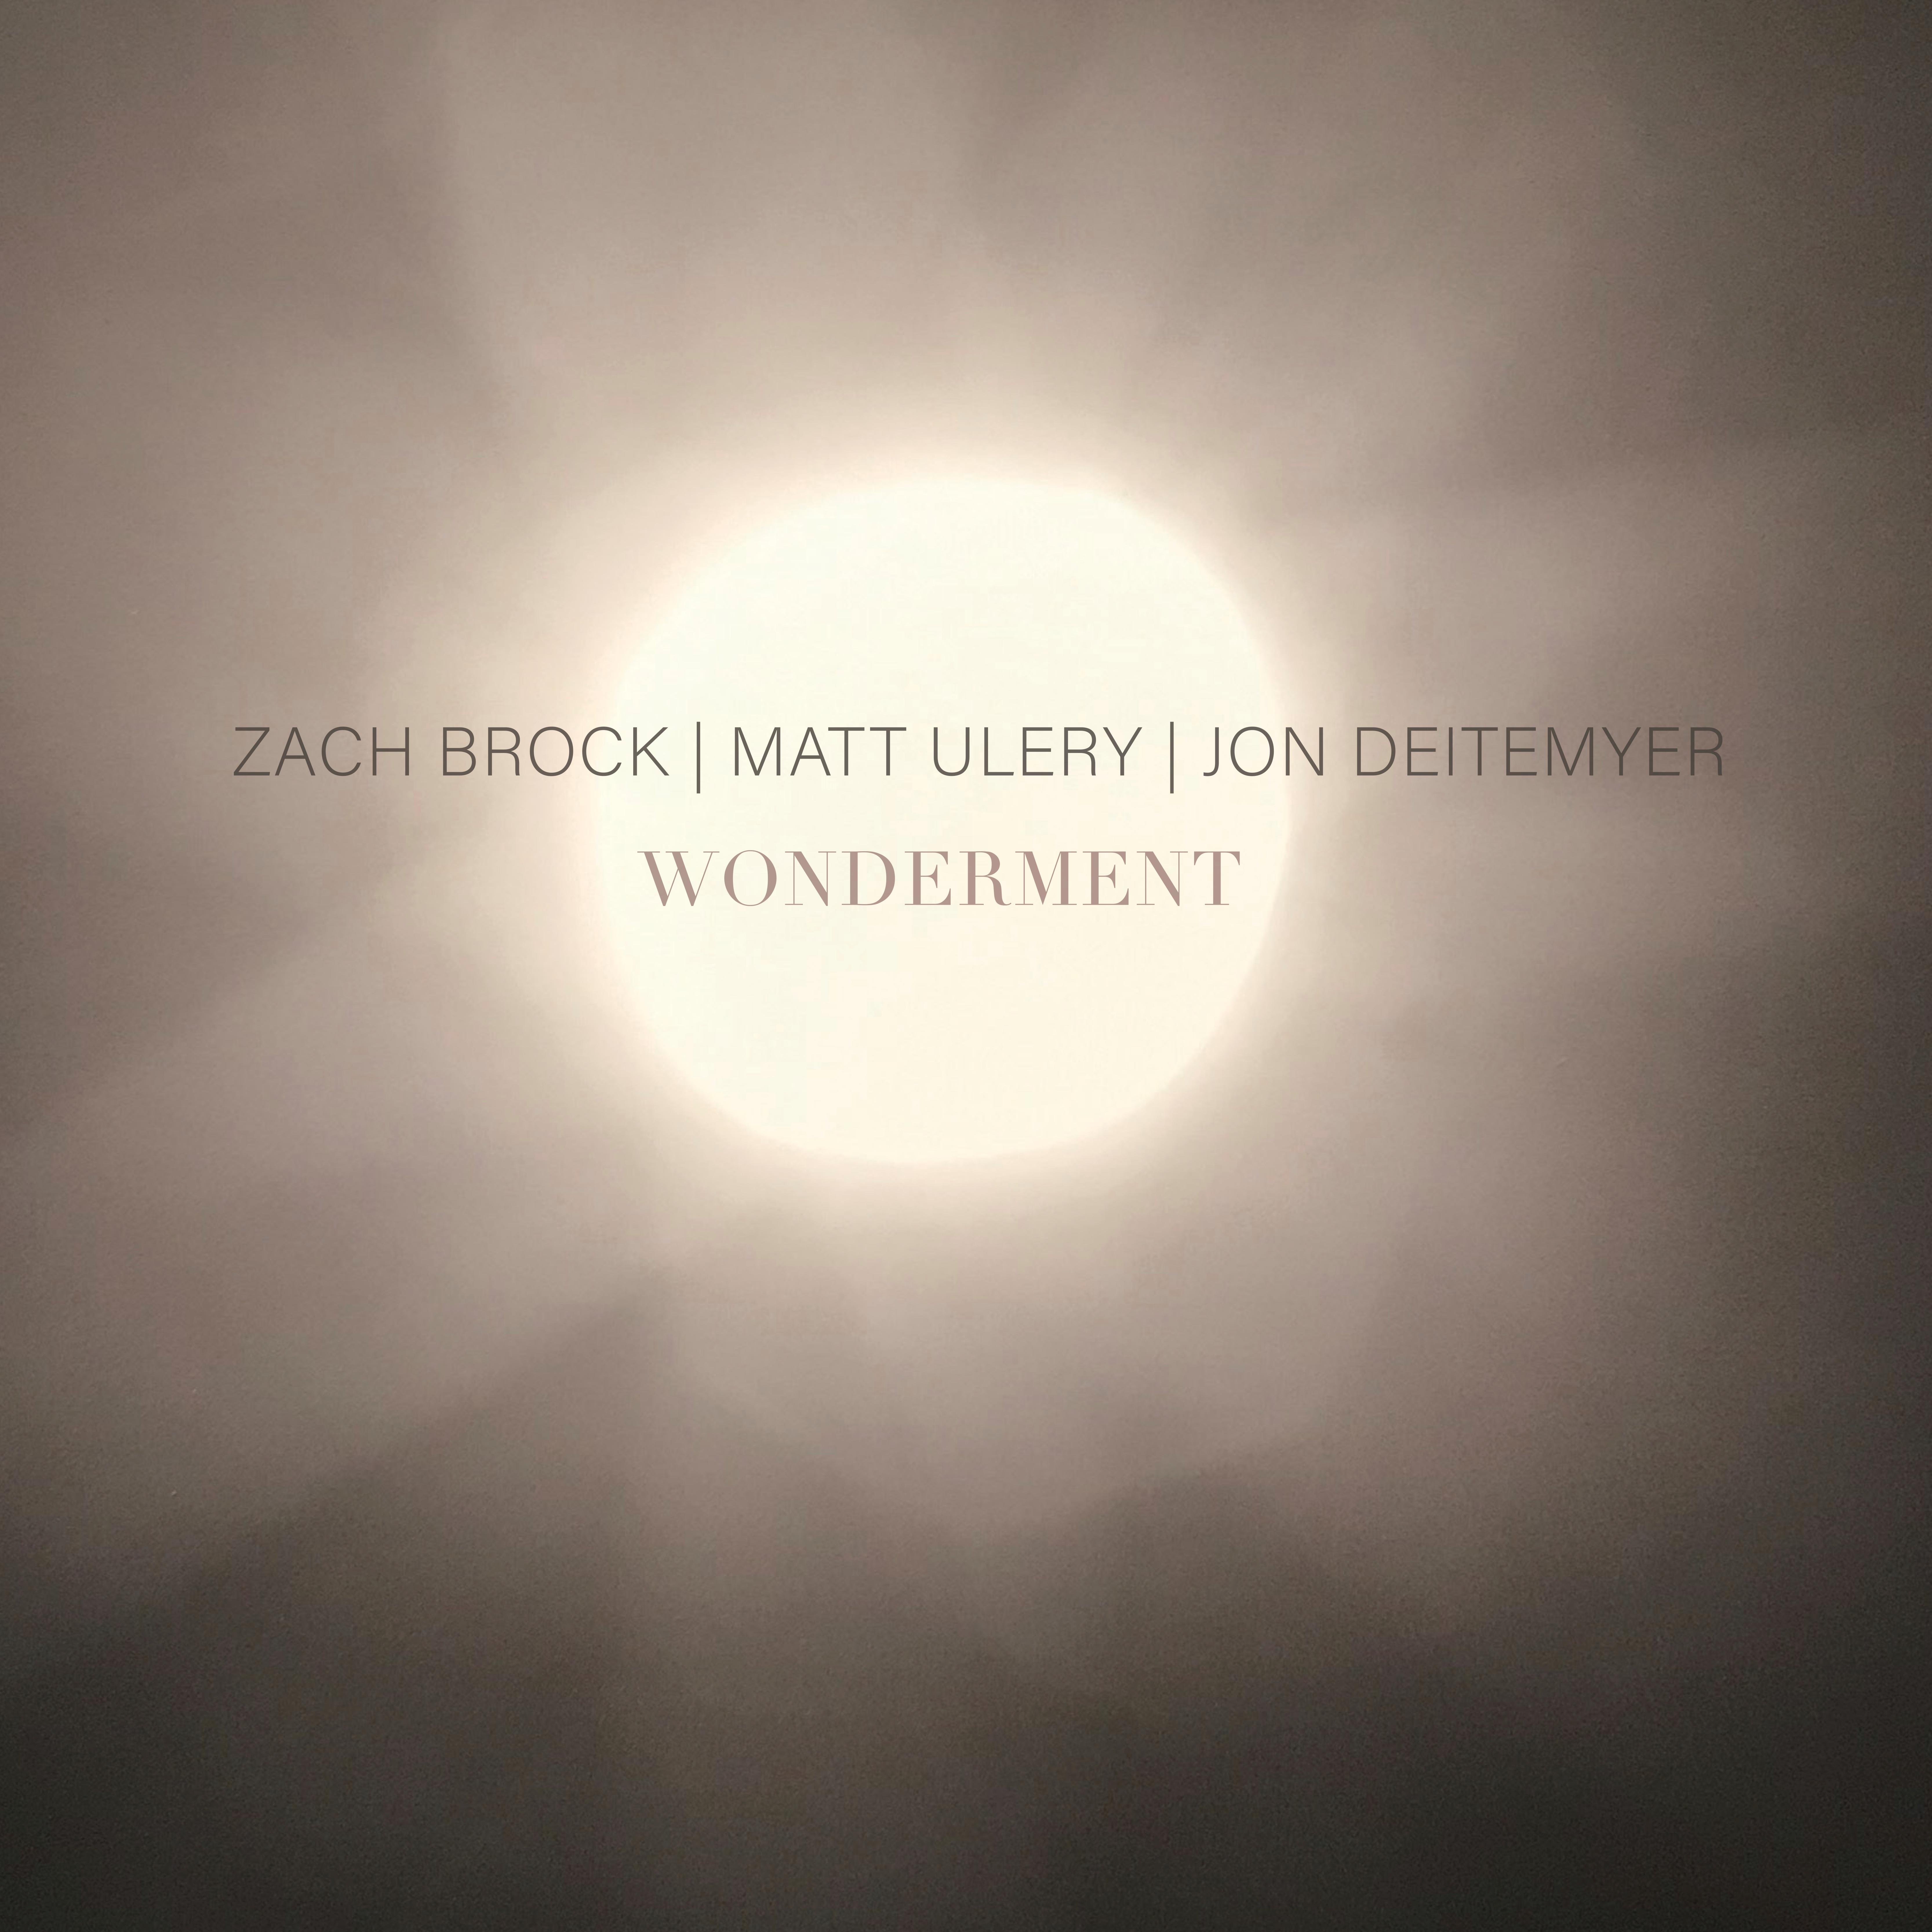 REVIEW: Zach Brock, Matt Ulery and Jon Deitemyer's Wonderment Reviewed by All About Jazz